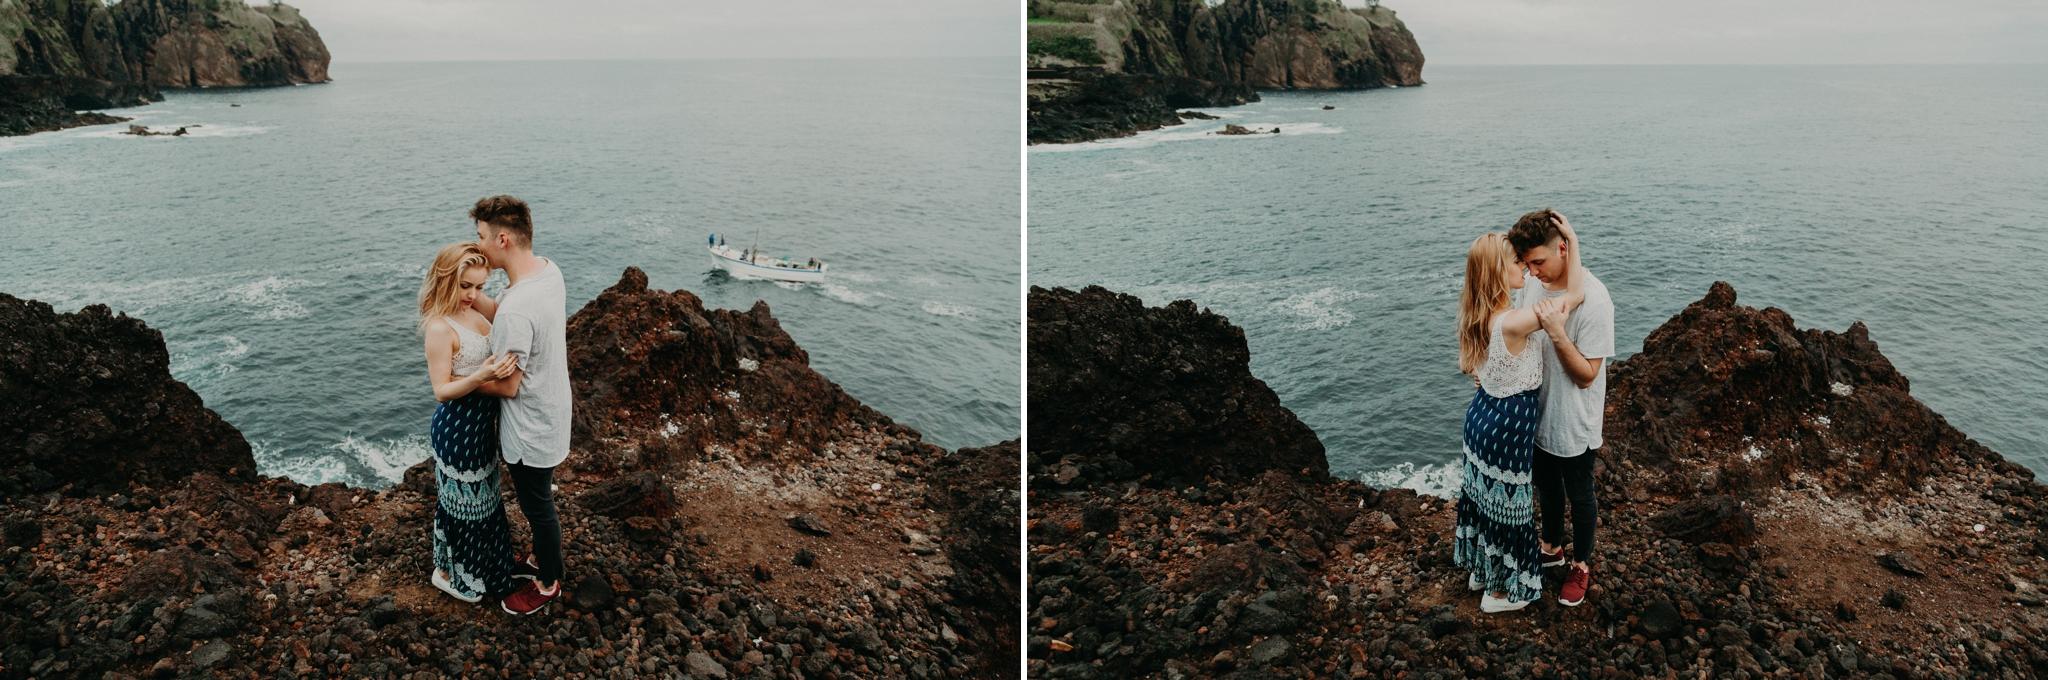 hawaii-engagement-photographer1.jpg